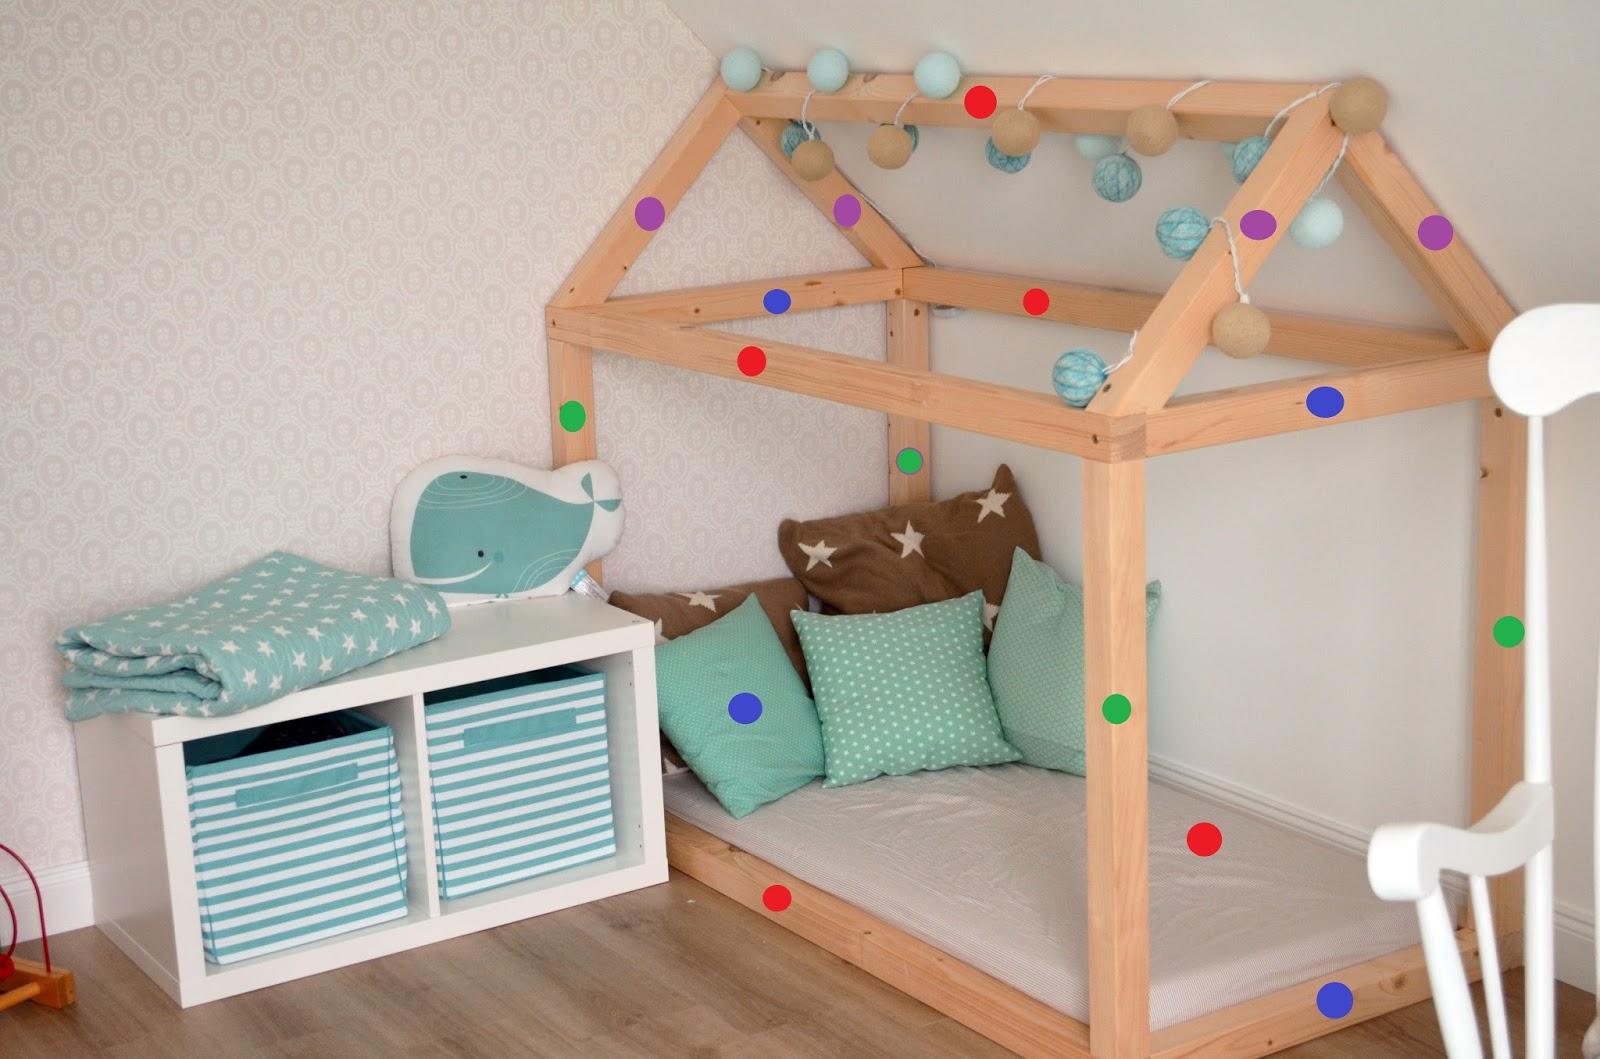 Kinderbett Selber Bauen Detaillierte Bauanleitung Kuschelhaus Deko Hus